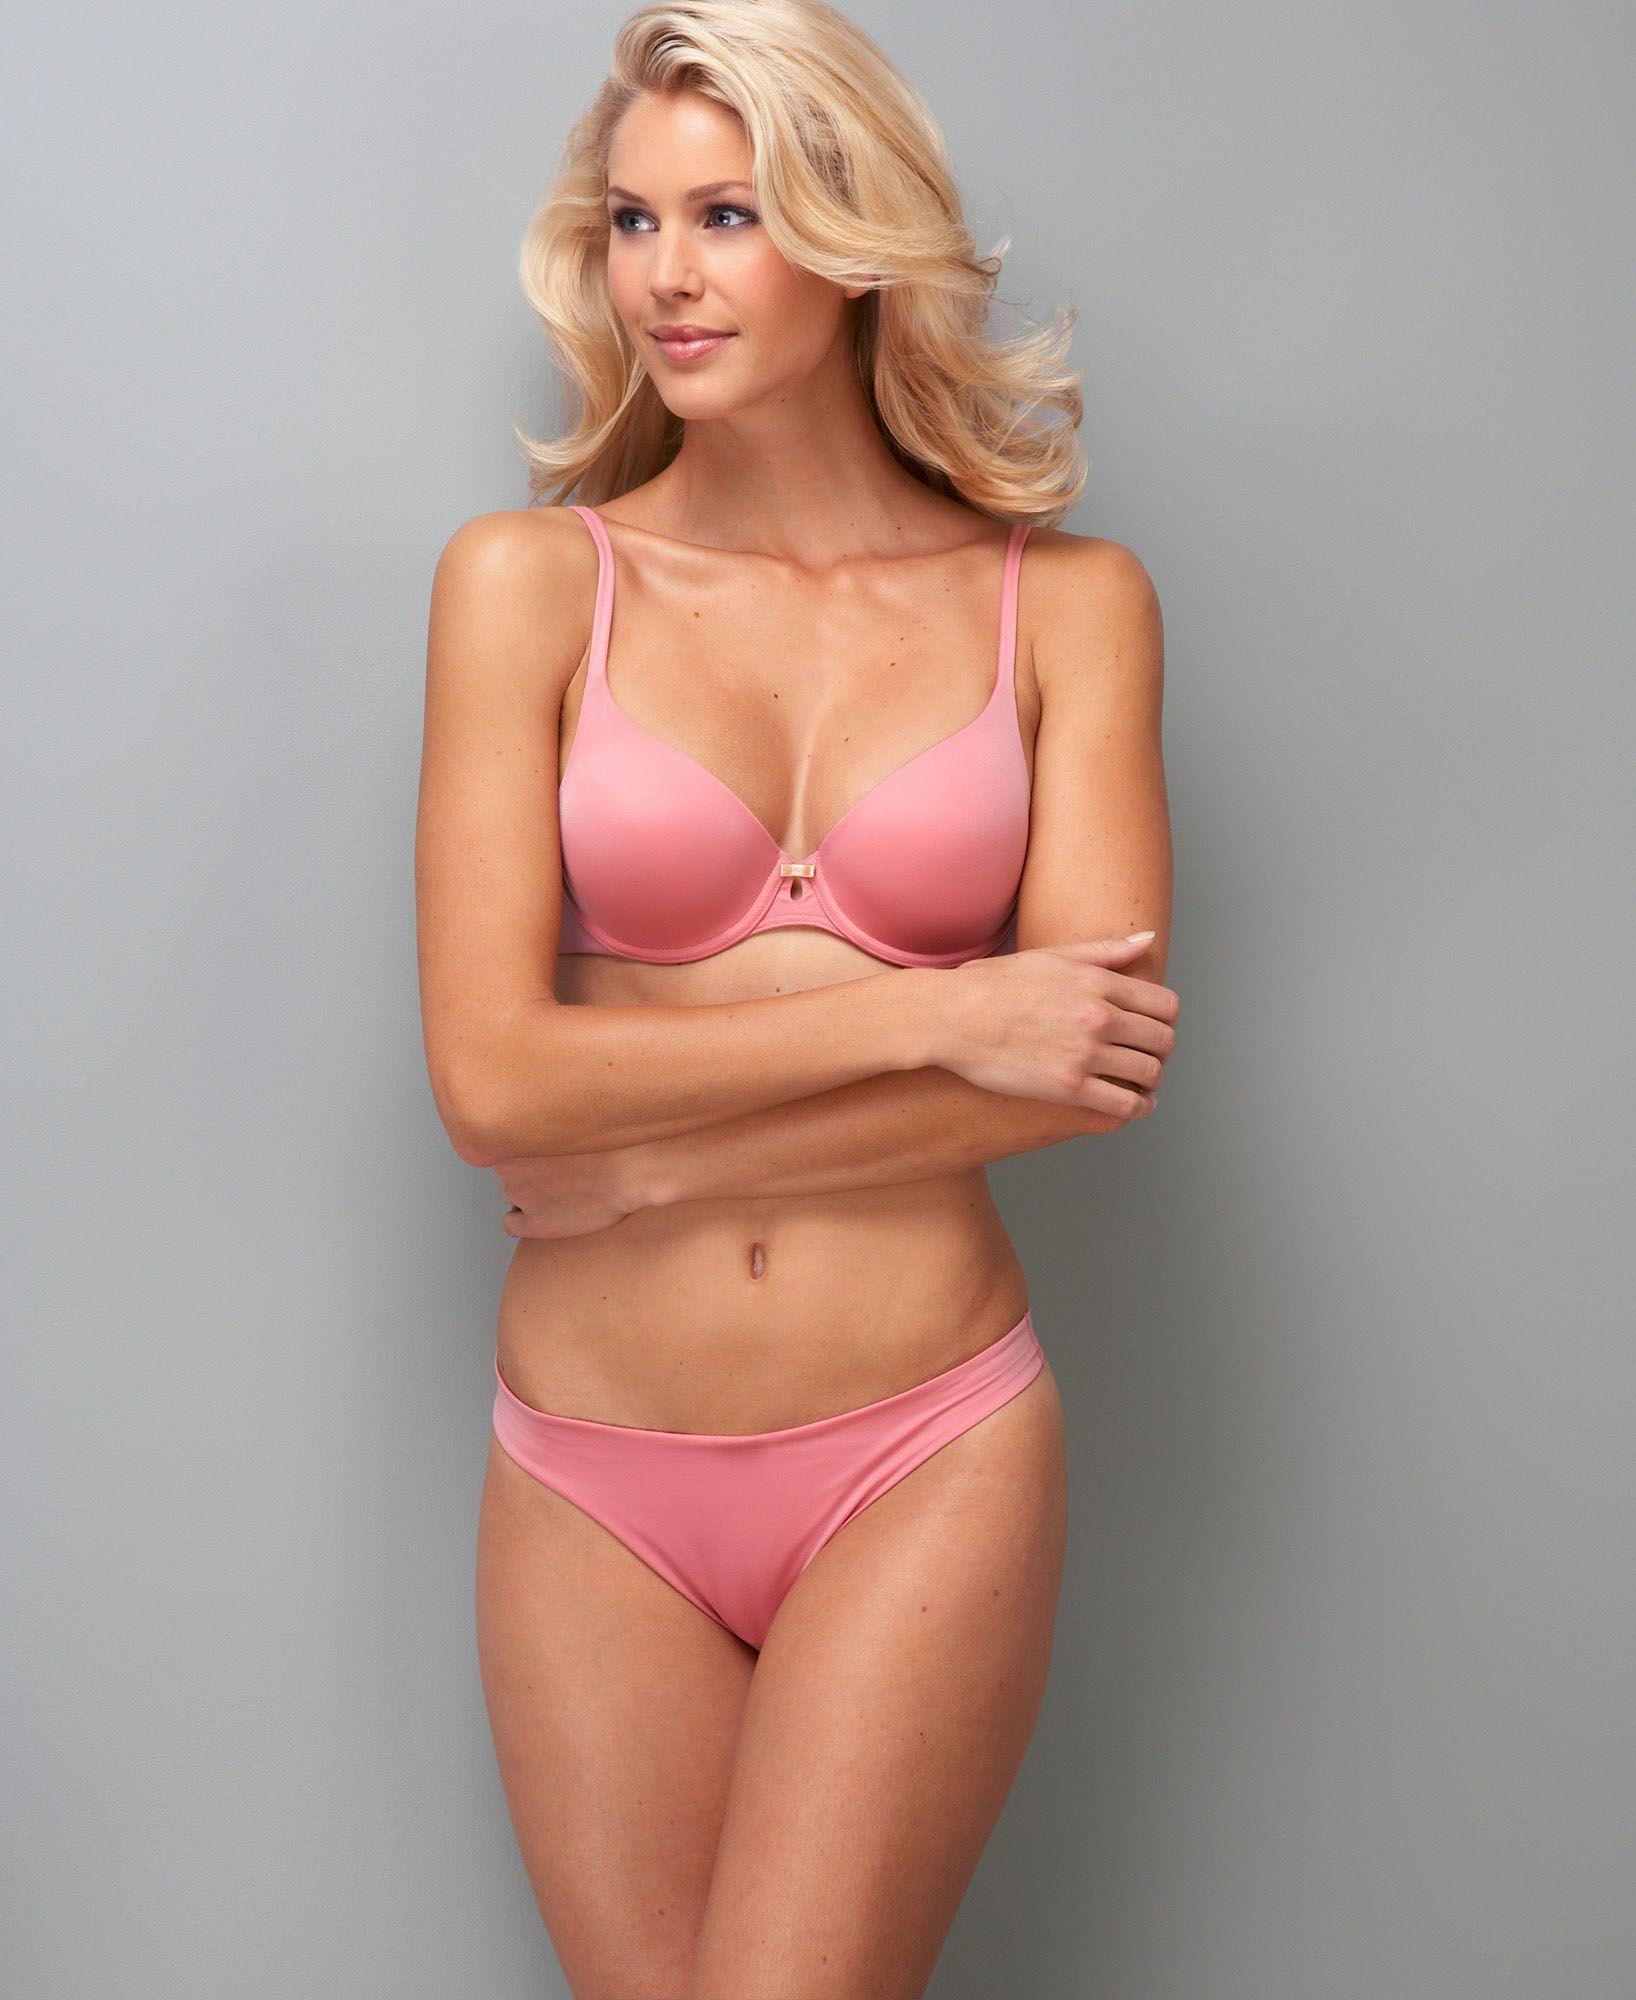 sandrine marlier cleavage